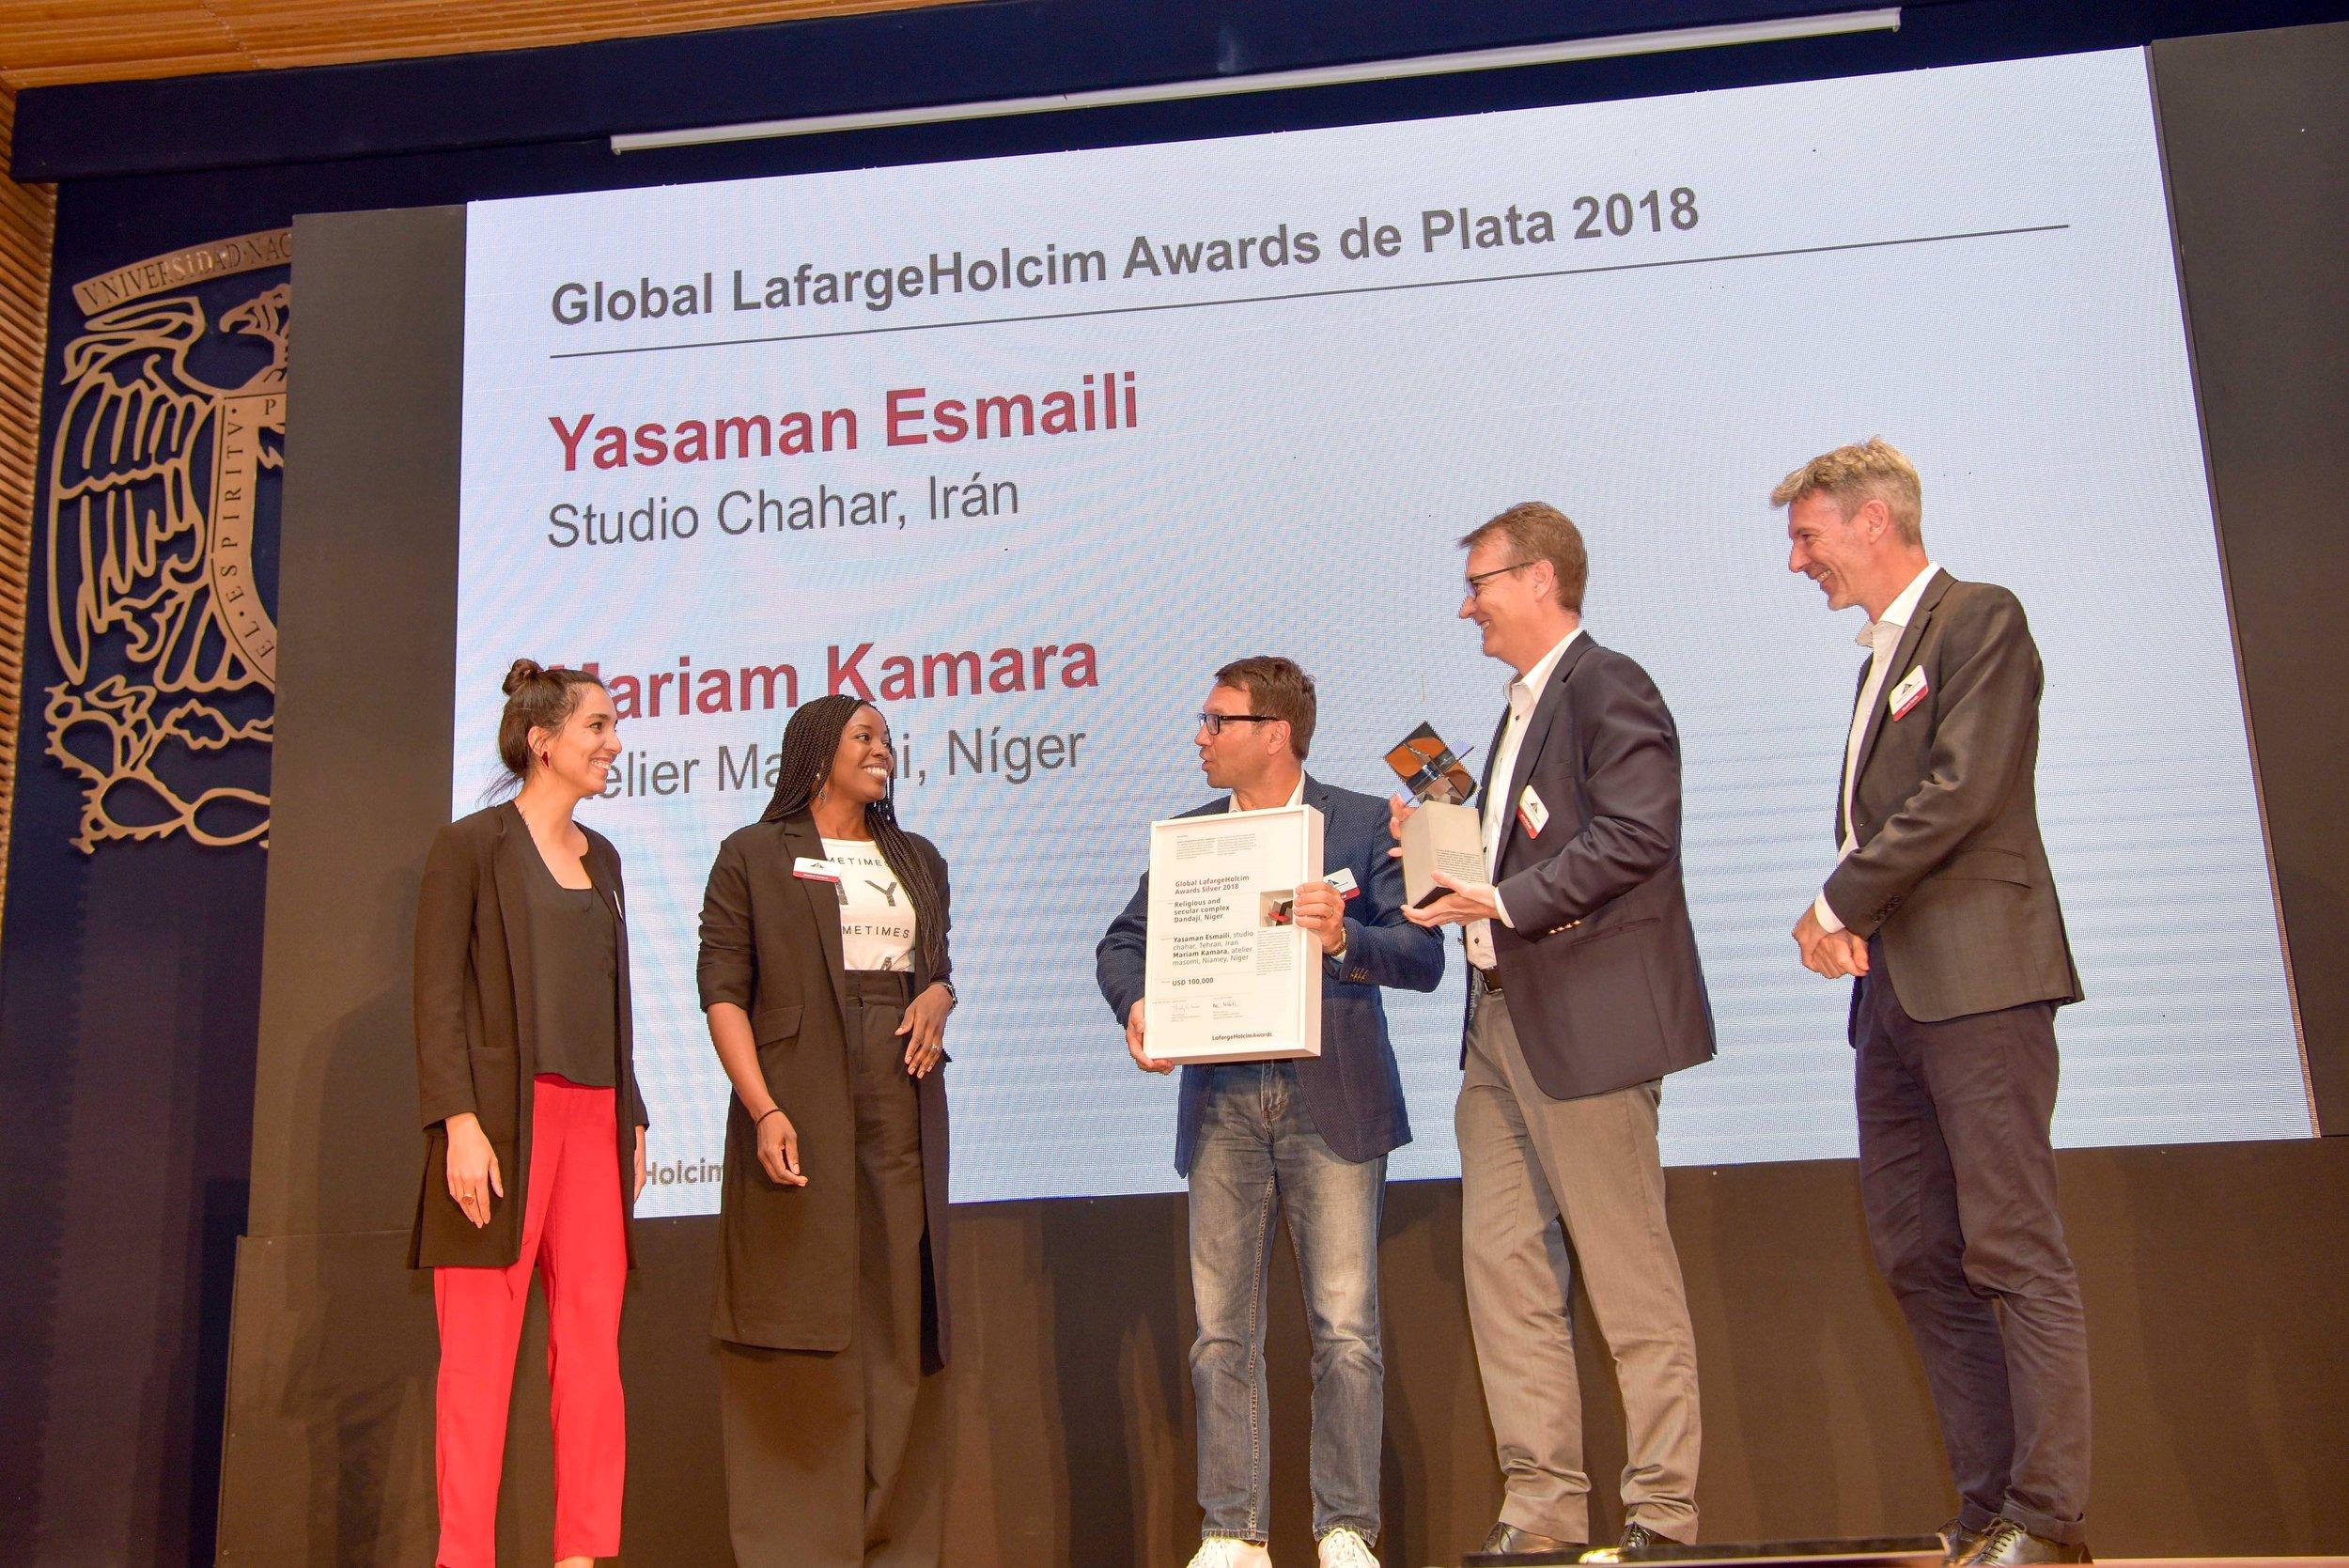 2018 LafargeHolcim Global Silver award